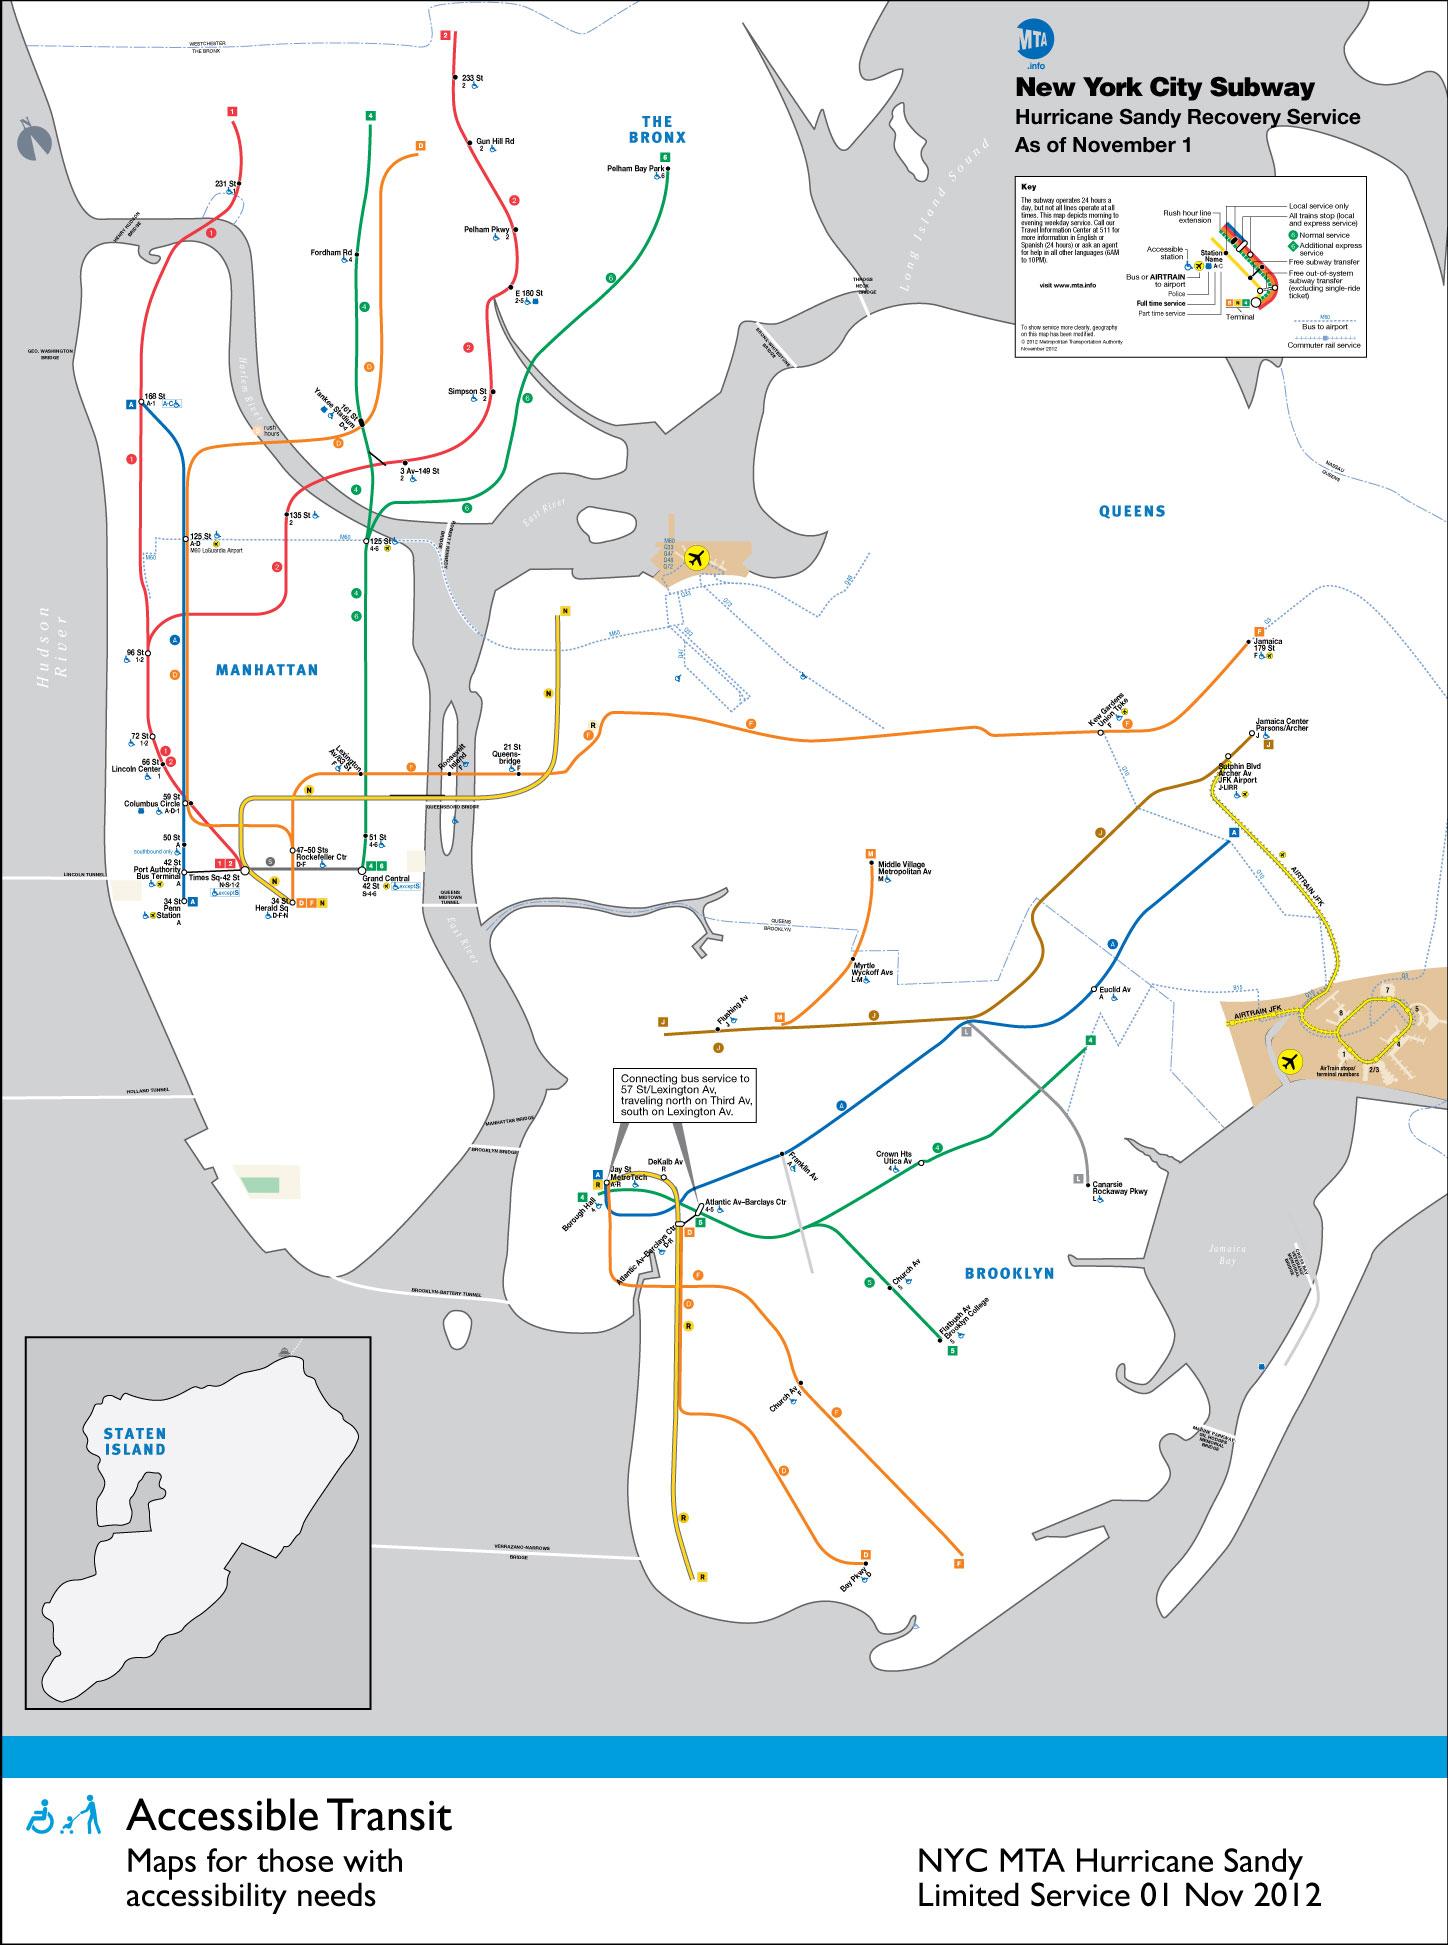 Subway Map Nyc 2012.Accessible Transit Nyc Subway Hurricane Sandy Service Urbnblog